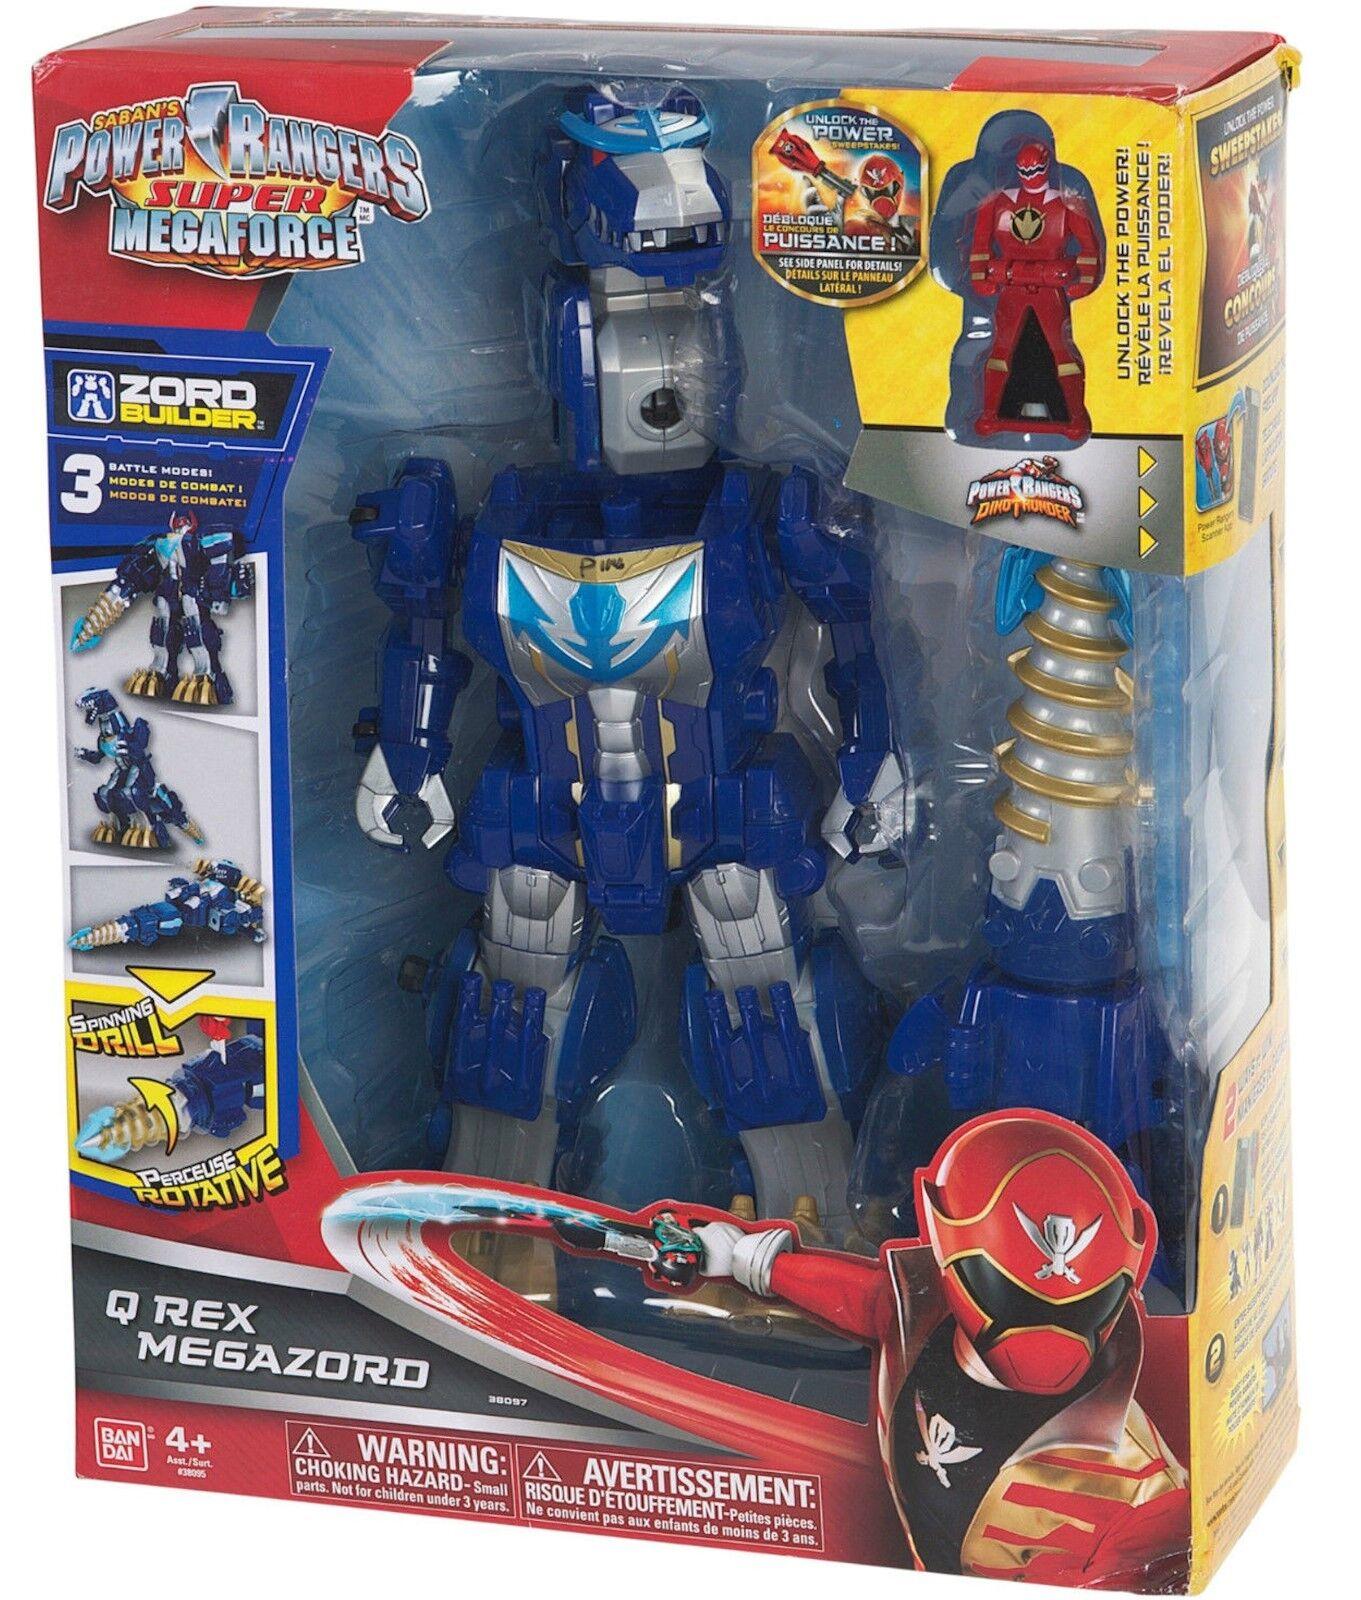 Power Rangers Super Megaforce Q Rex Megazord New Factory Sealed 2014